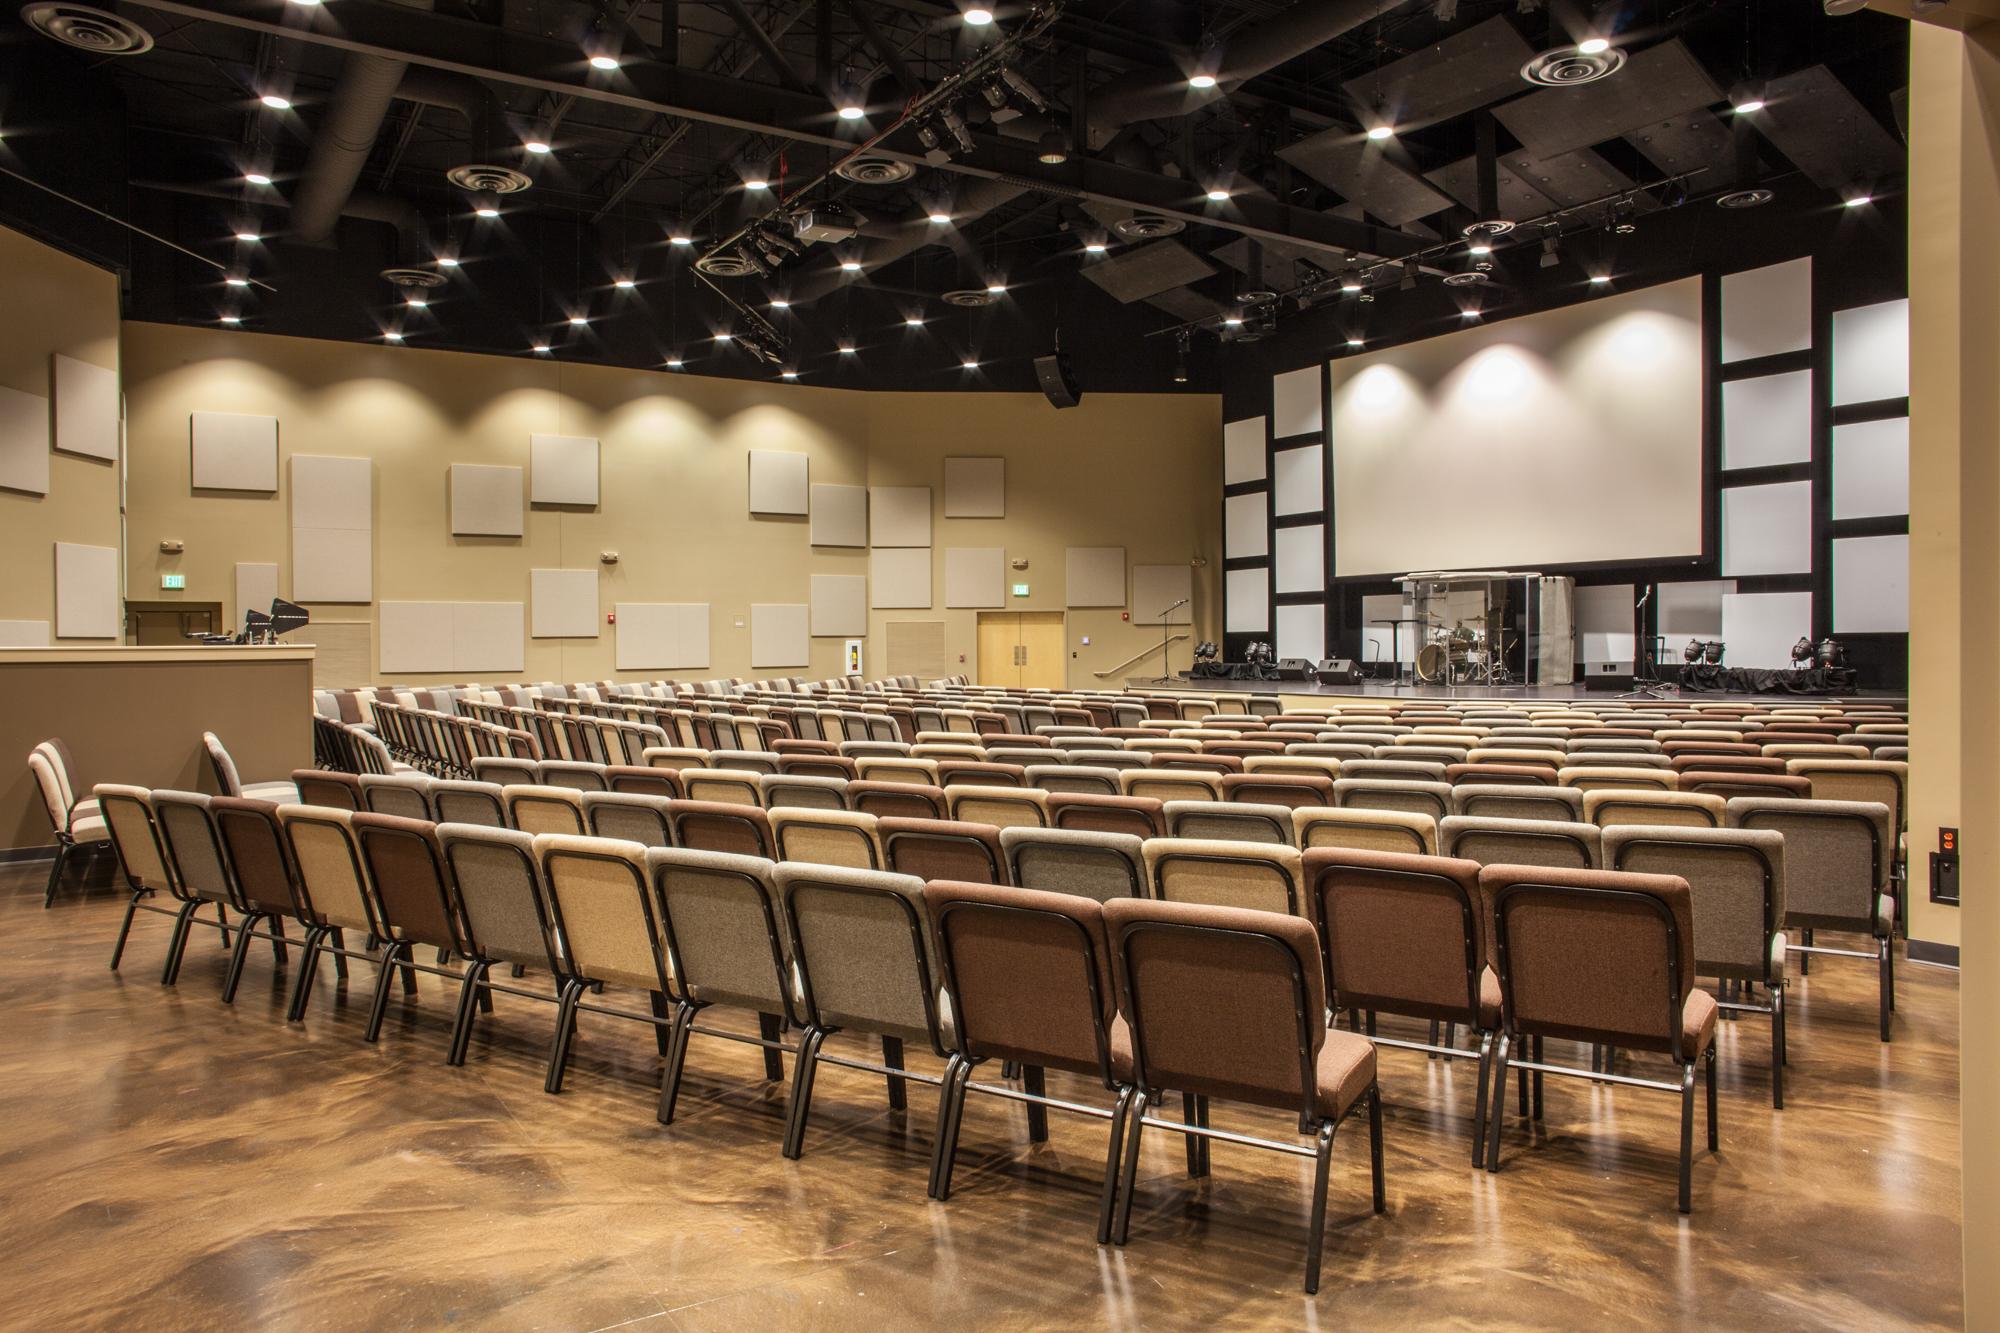 Lifesong Church